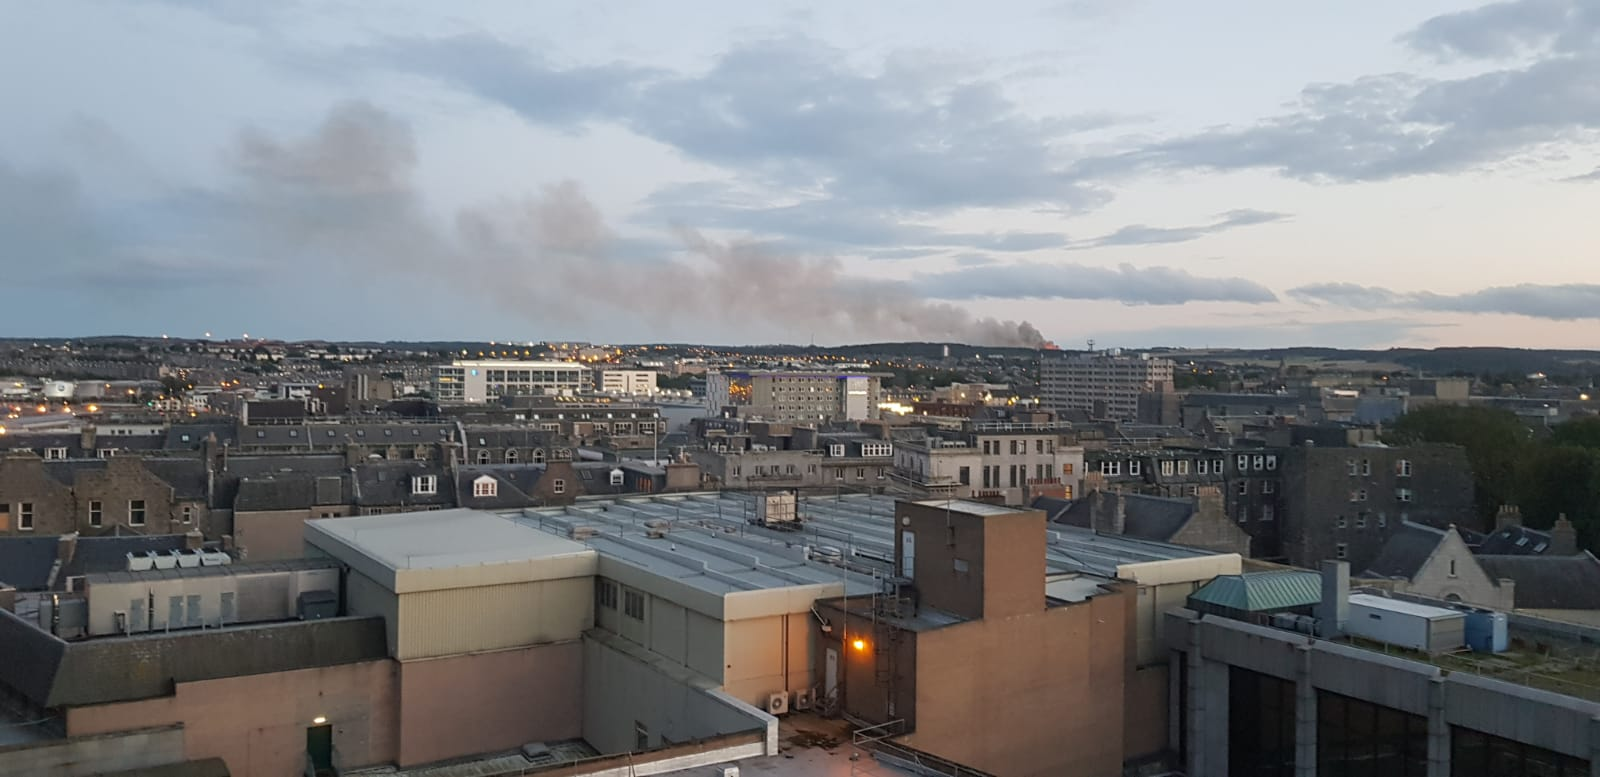 The fire seen last Sunday